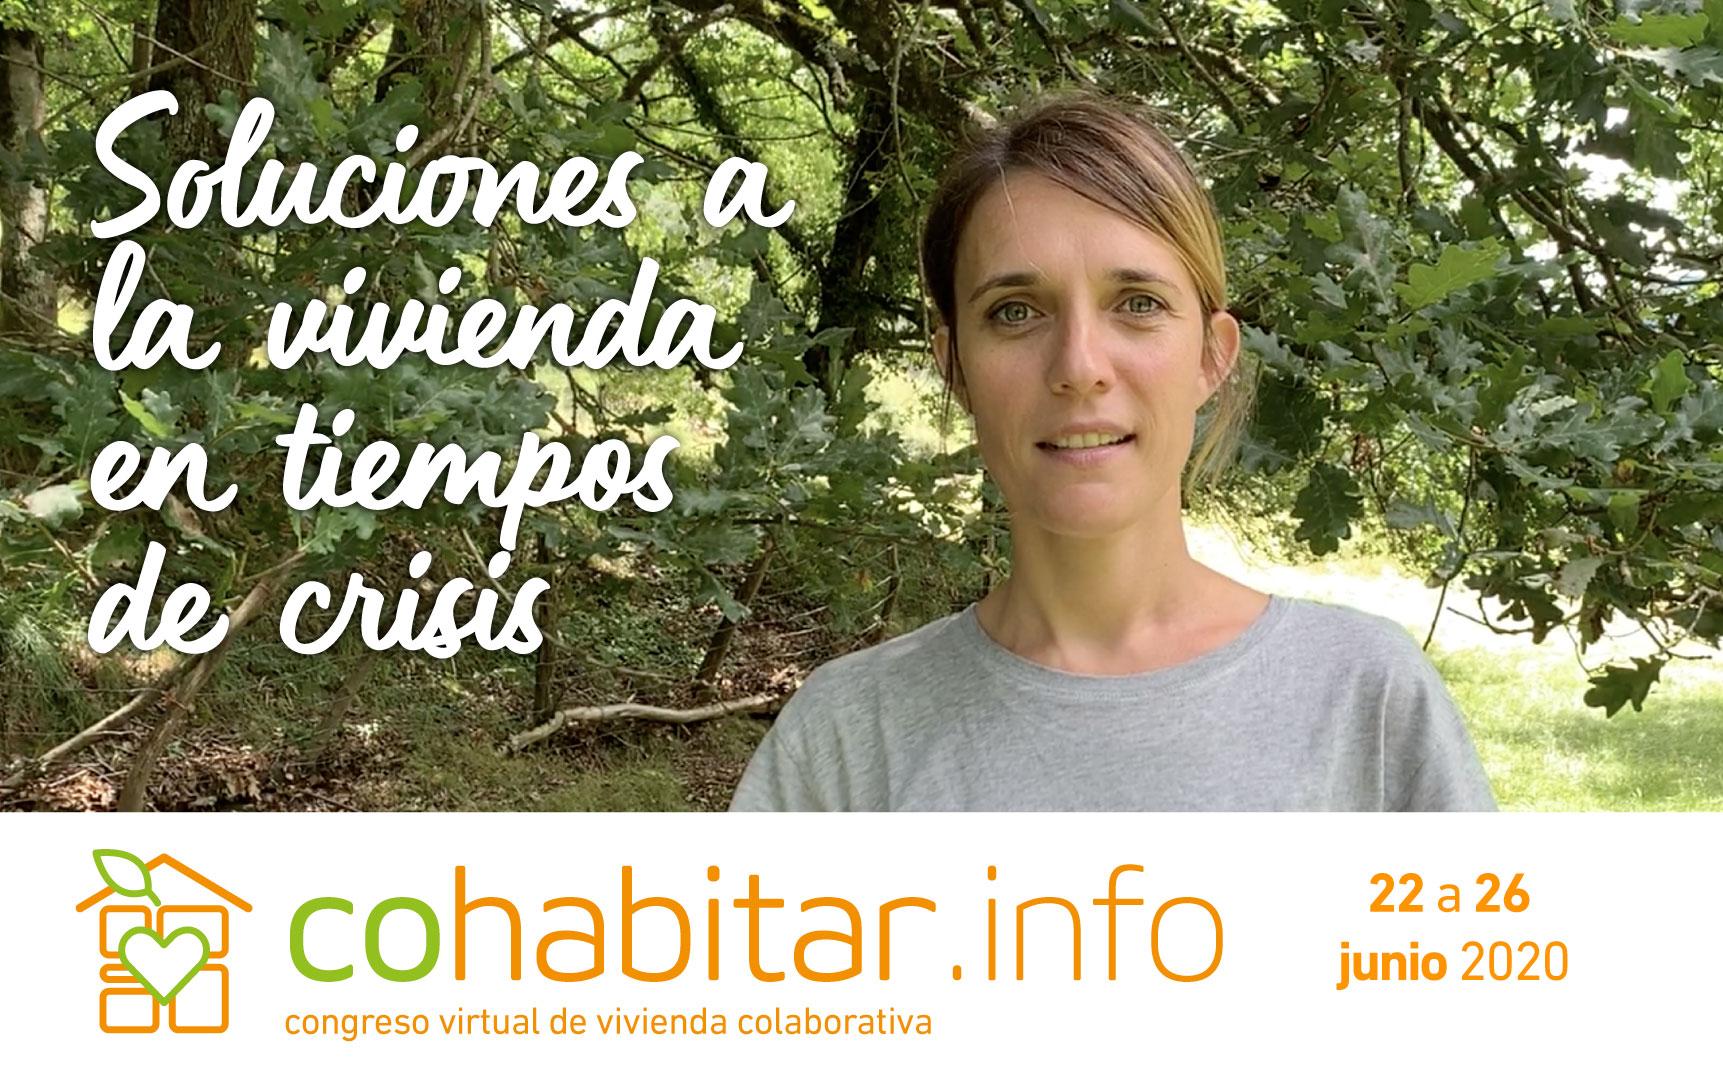 cohabitar videos vivienda crisis congreso virtual ariwake vivienda colaborativa